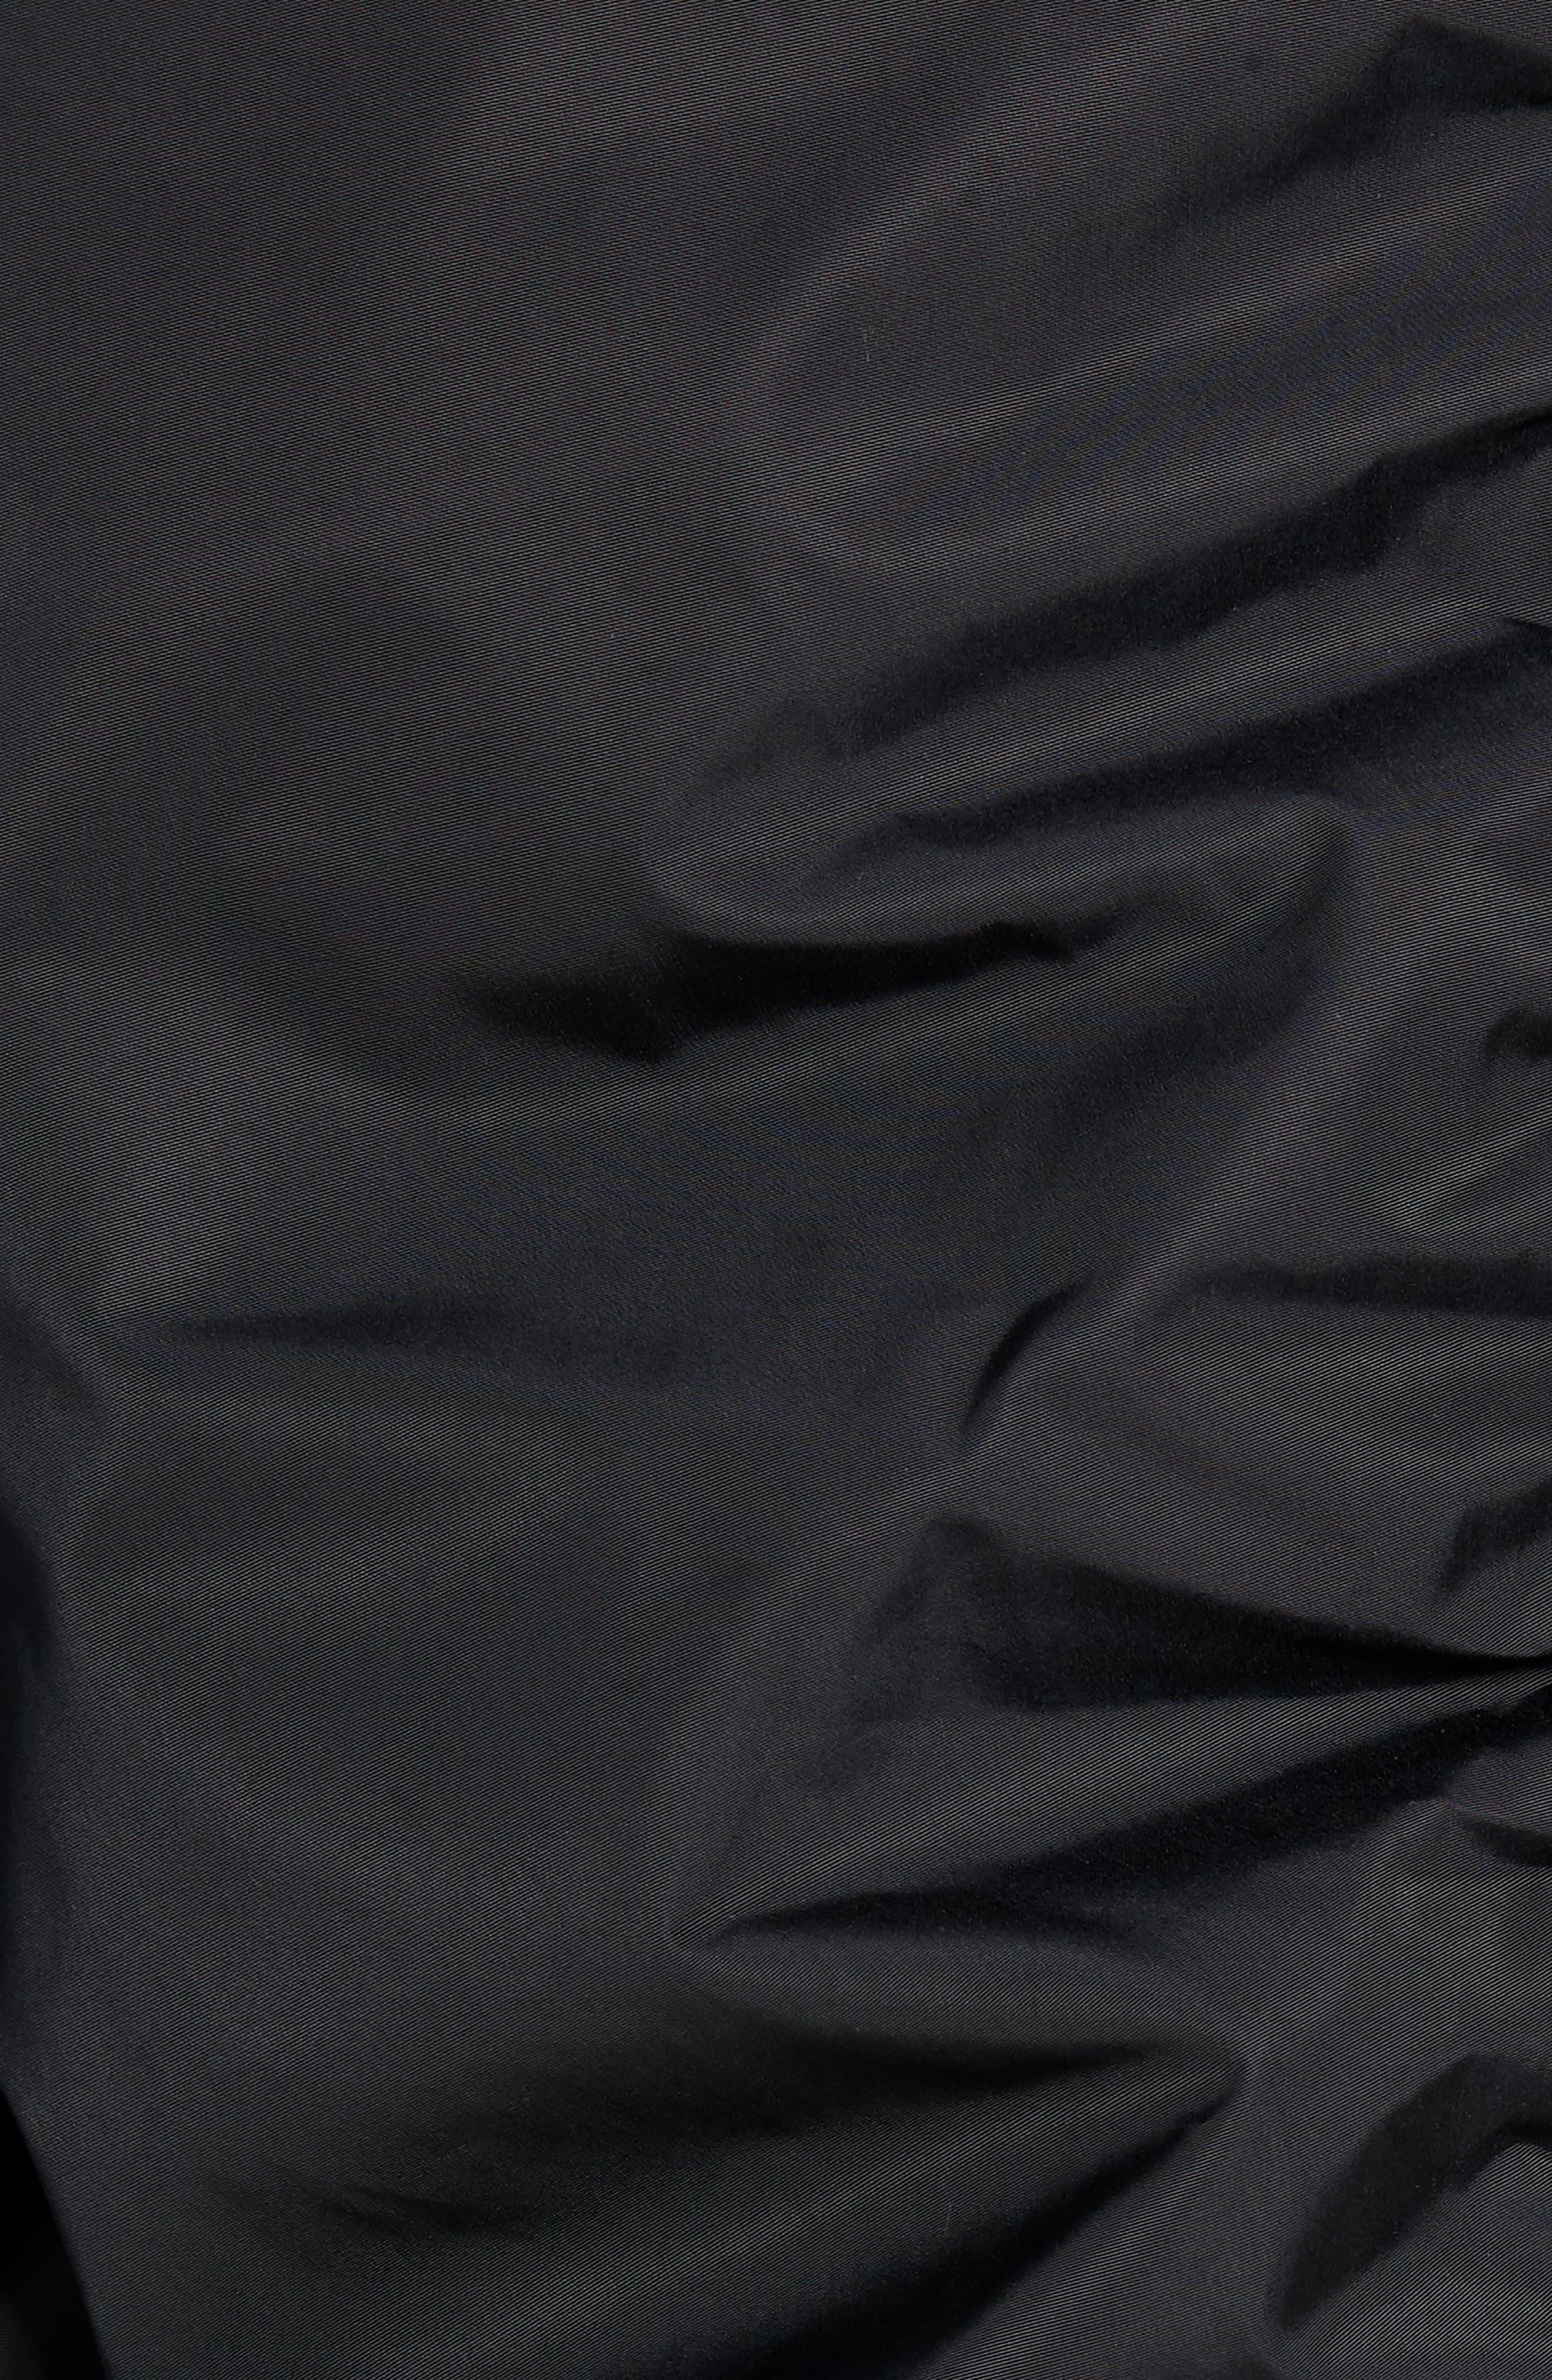 Hooded Nylon Bomber Jacket,                             Alternate thumbnail 7, color,                             BLACK ROCK